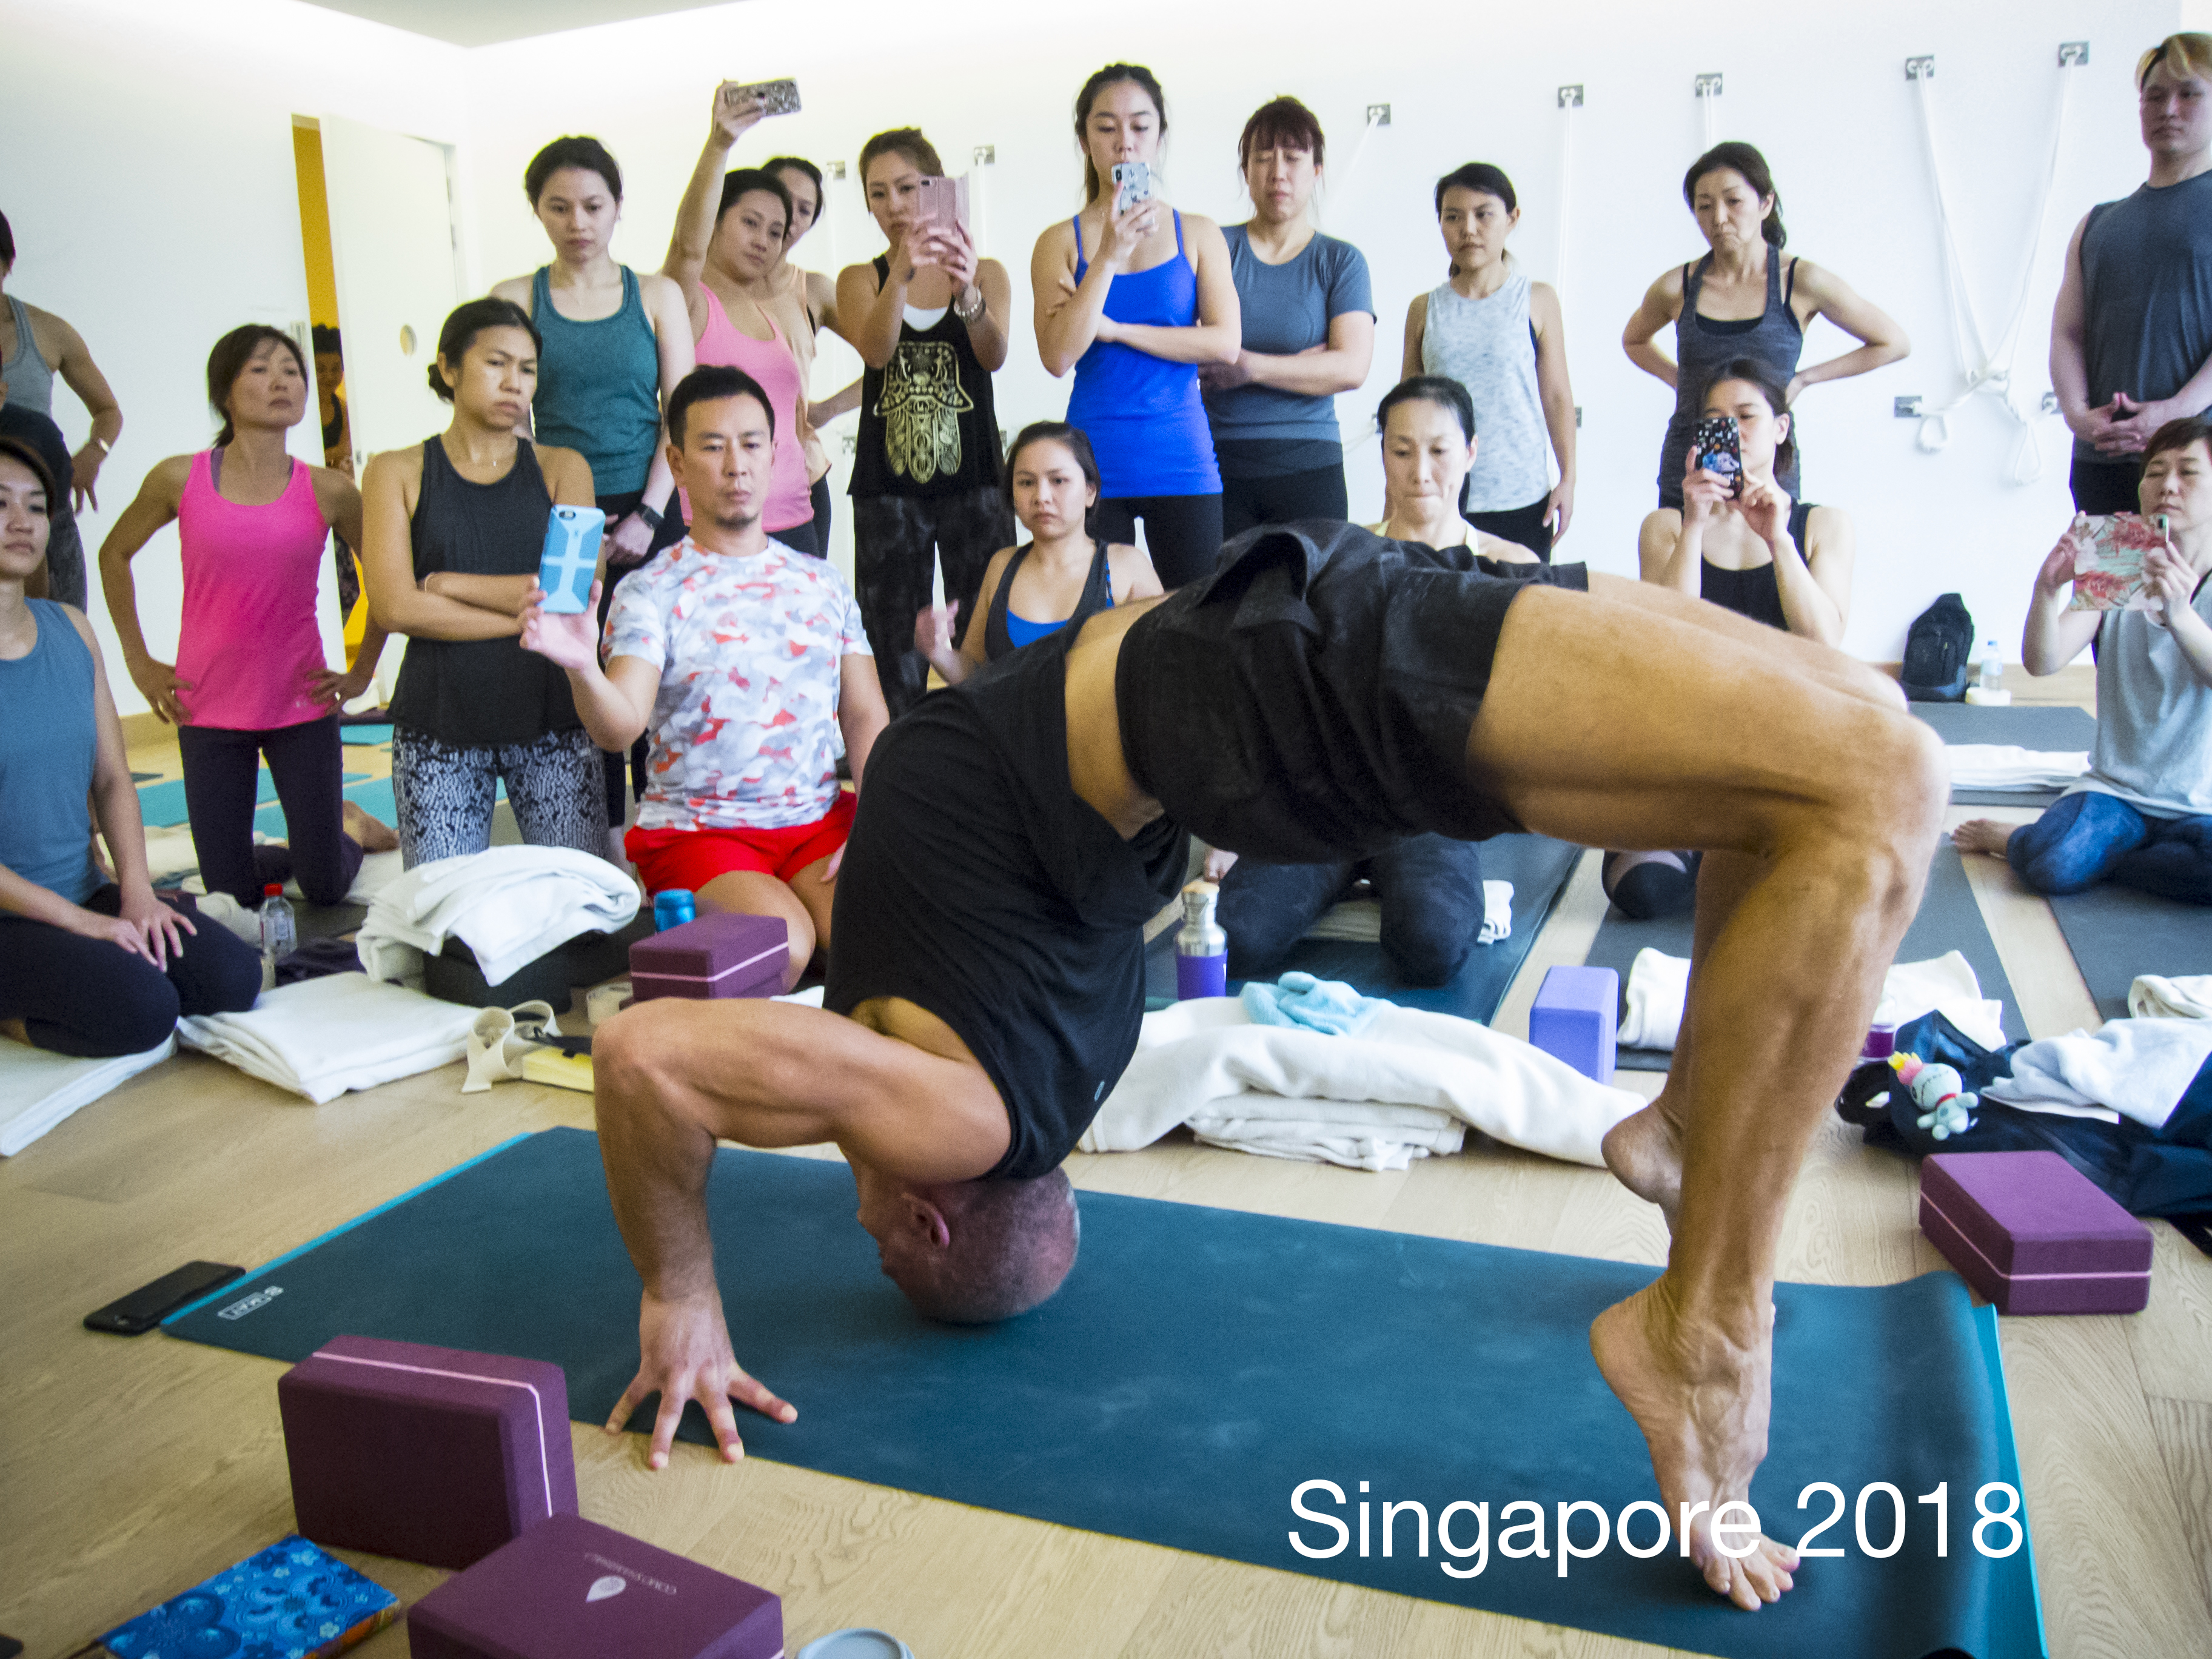 Andrew Rivin, Singapore 2018